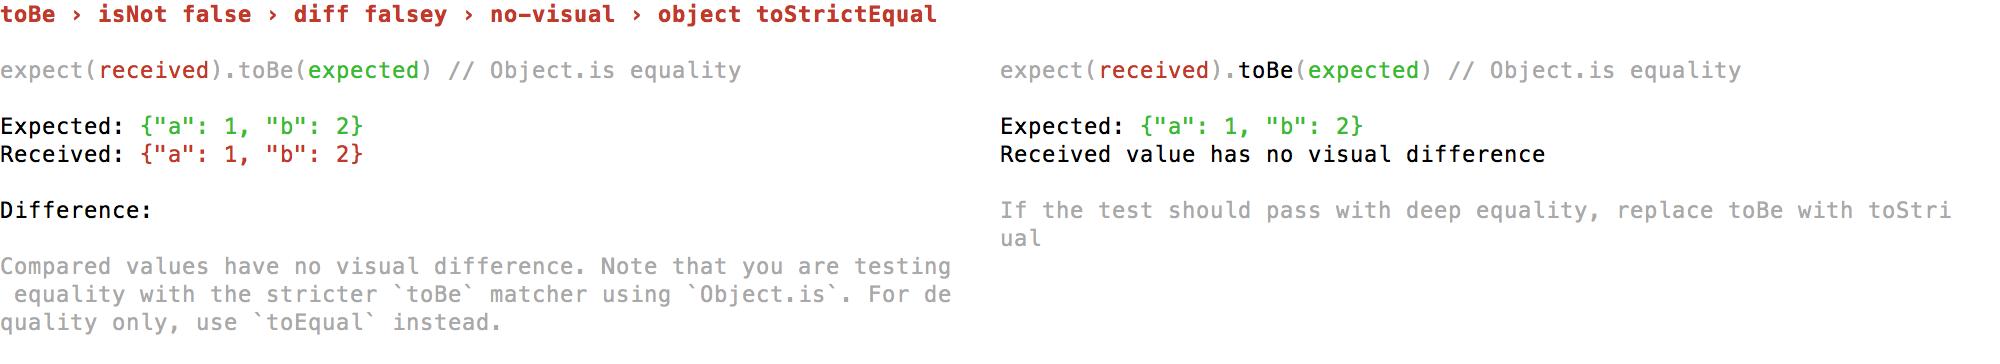 false falsey no-visual object toStrictEqual